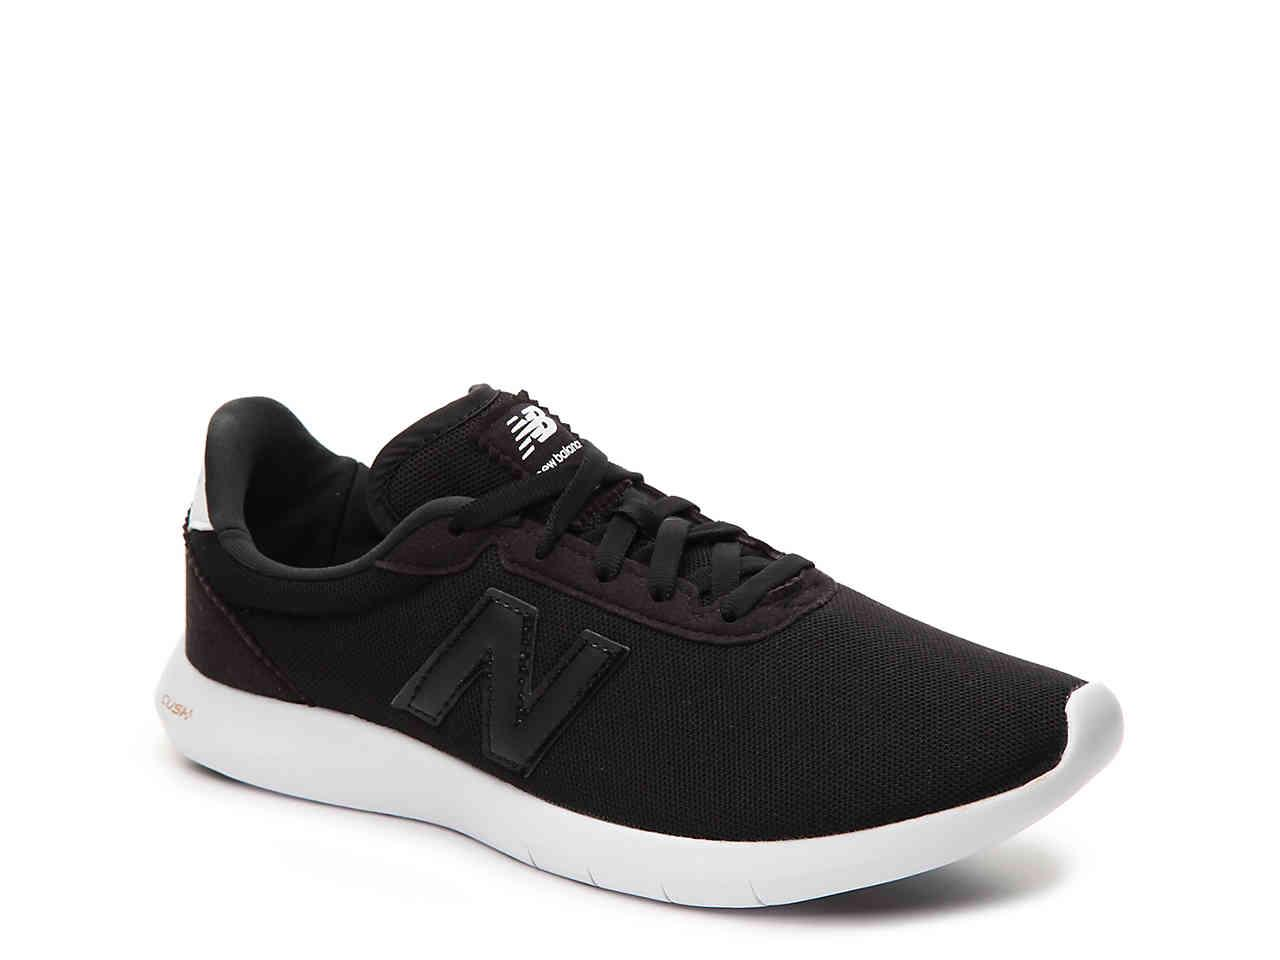 New Balance 514 Lightweight Training Shoe in Black - Lyst